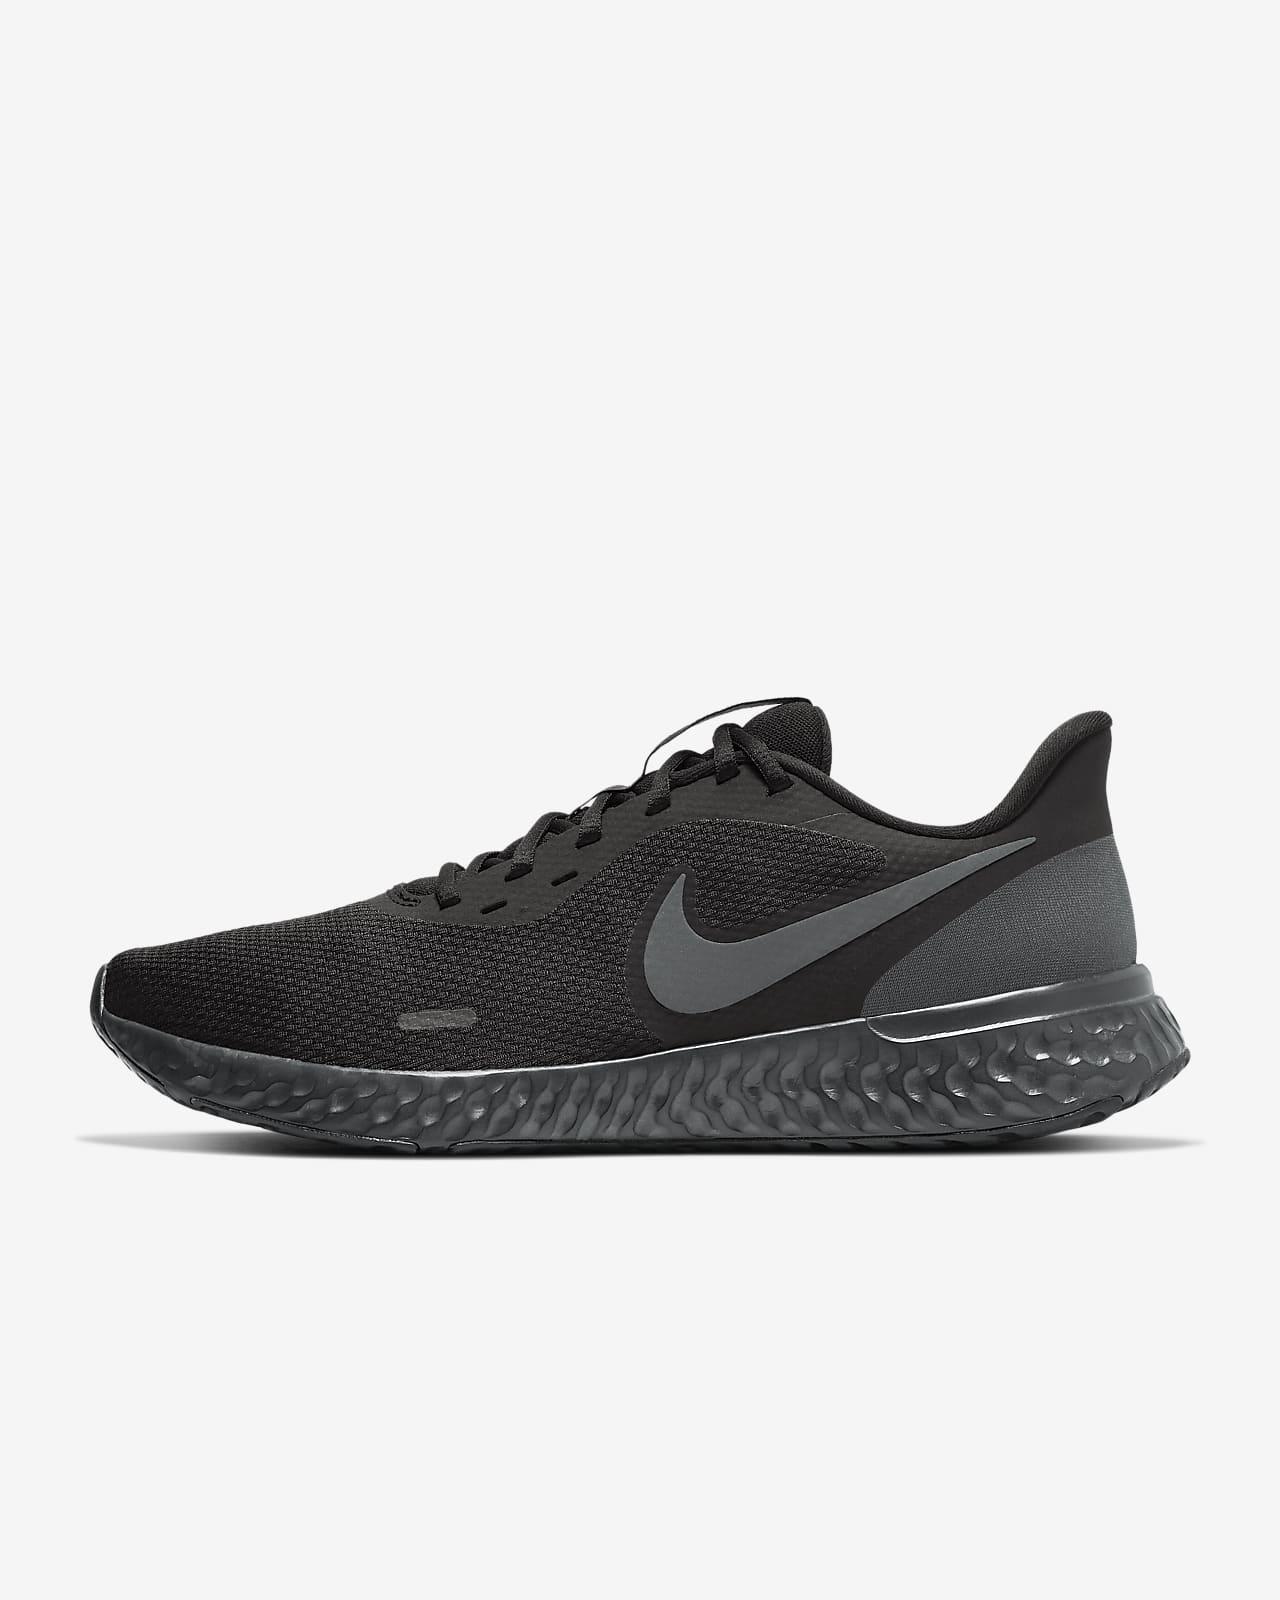 Sapatilhas de running Nike Revolution 5 para homem